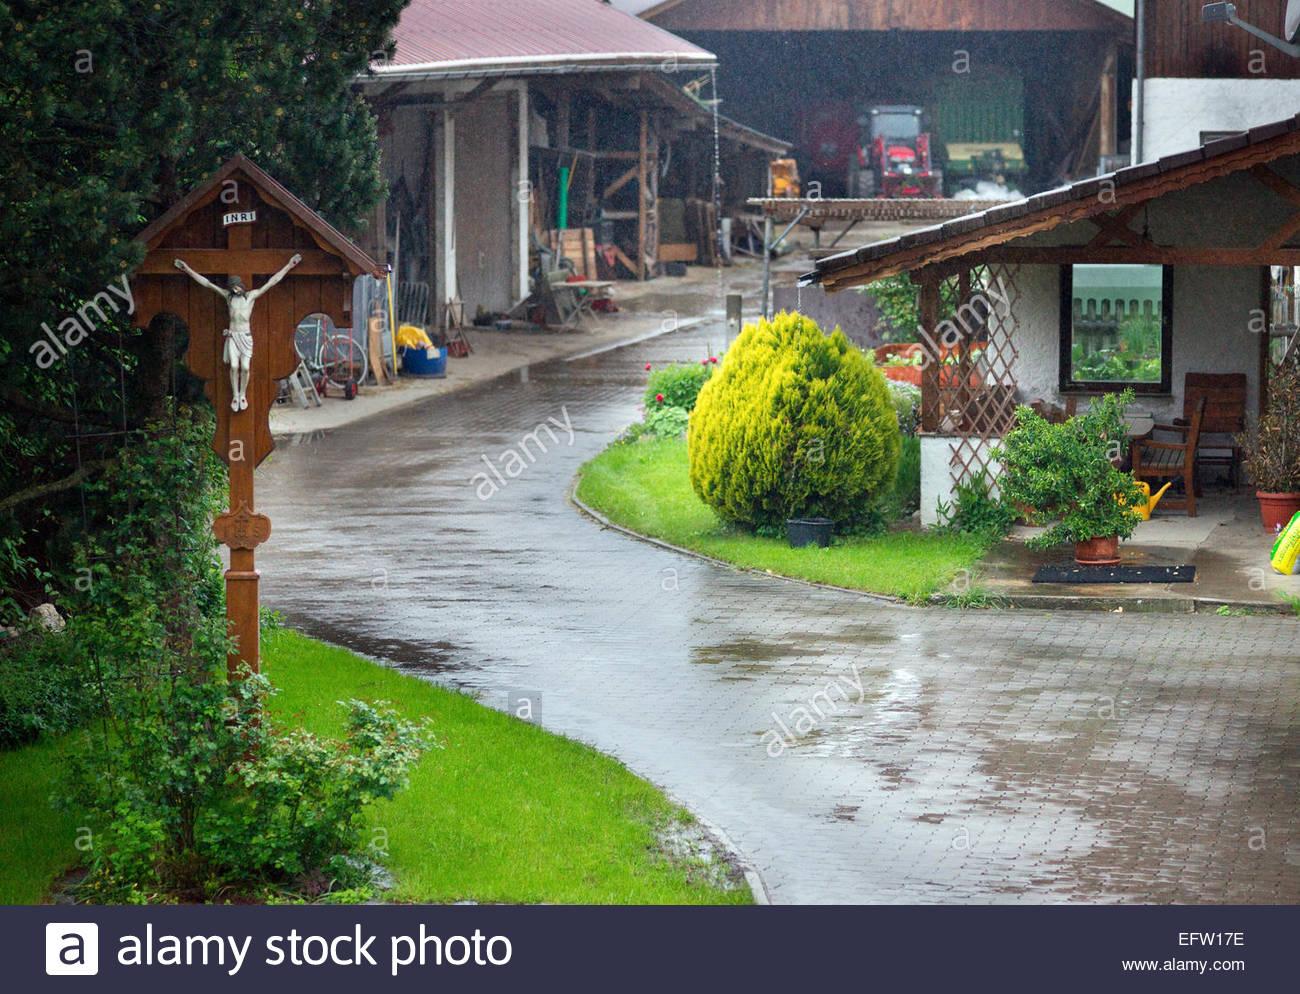 4c7356a6cc Small German Village Raining Rain Farmhouses Germany é─∞ Federal Republic  of Germany Europe Deutschland DE DEU Bavaria Bayern N